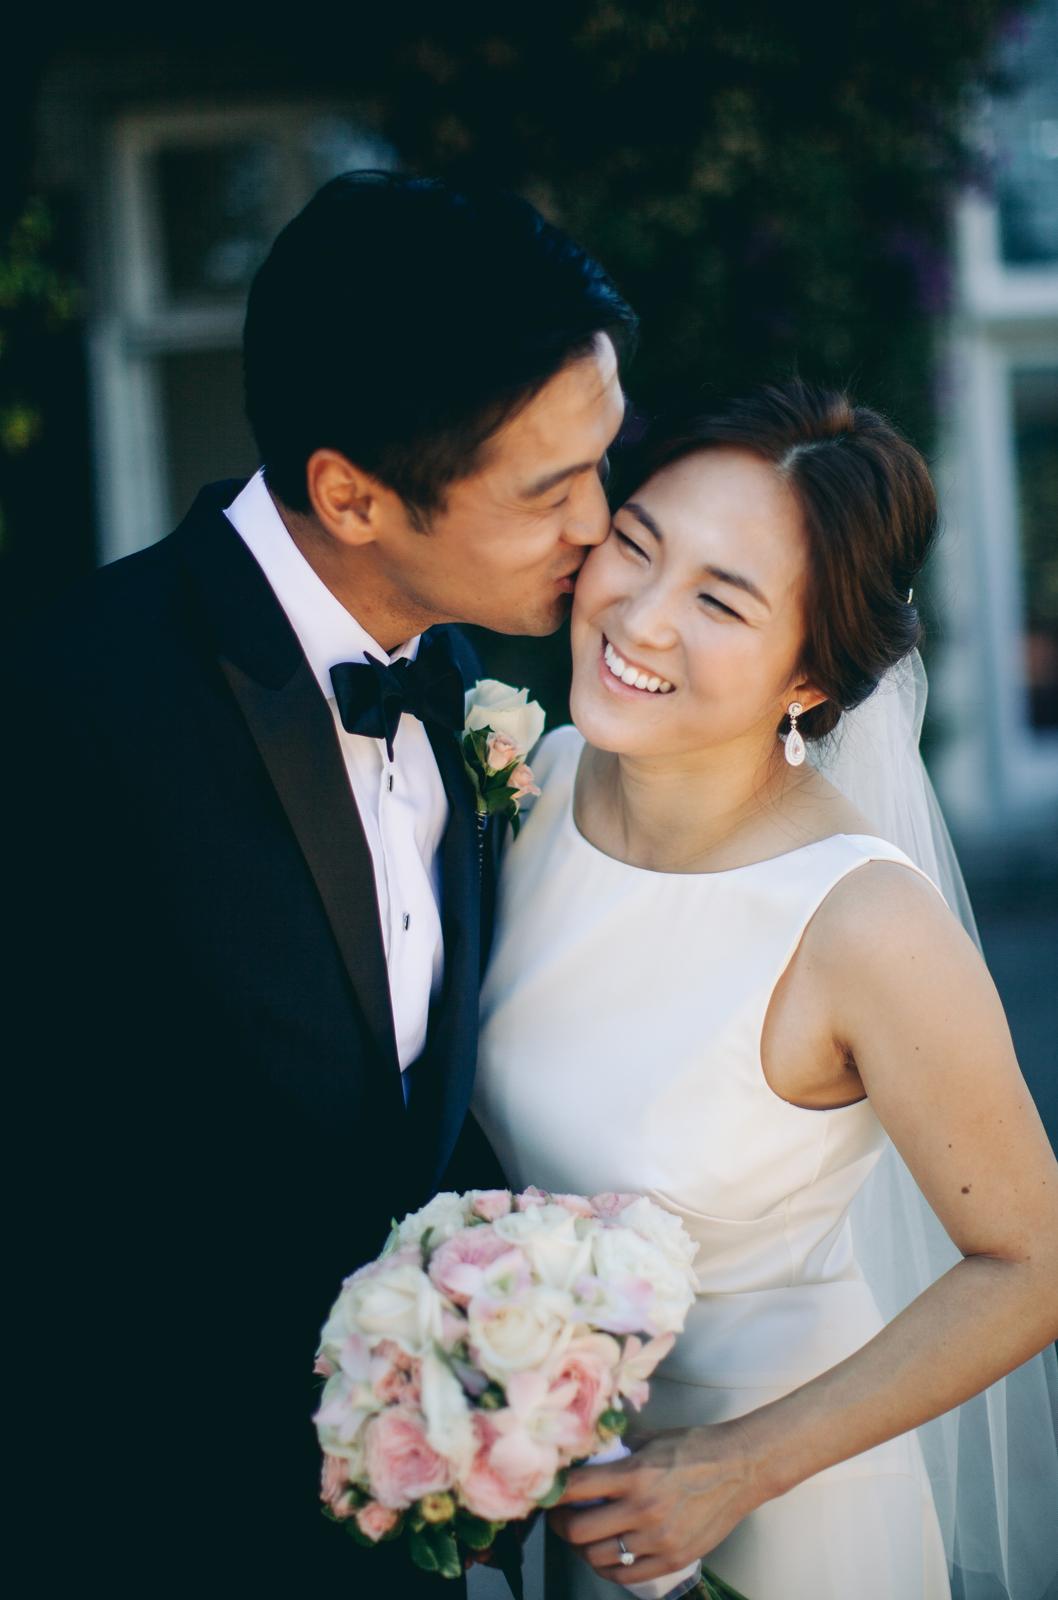 kohl_manison_wedding_photography_sarah_eric_ebony_siovhan_bokeh_photography_033.jpg